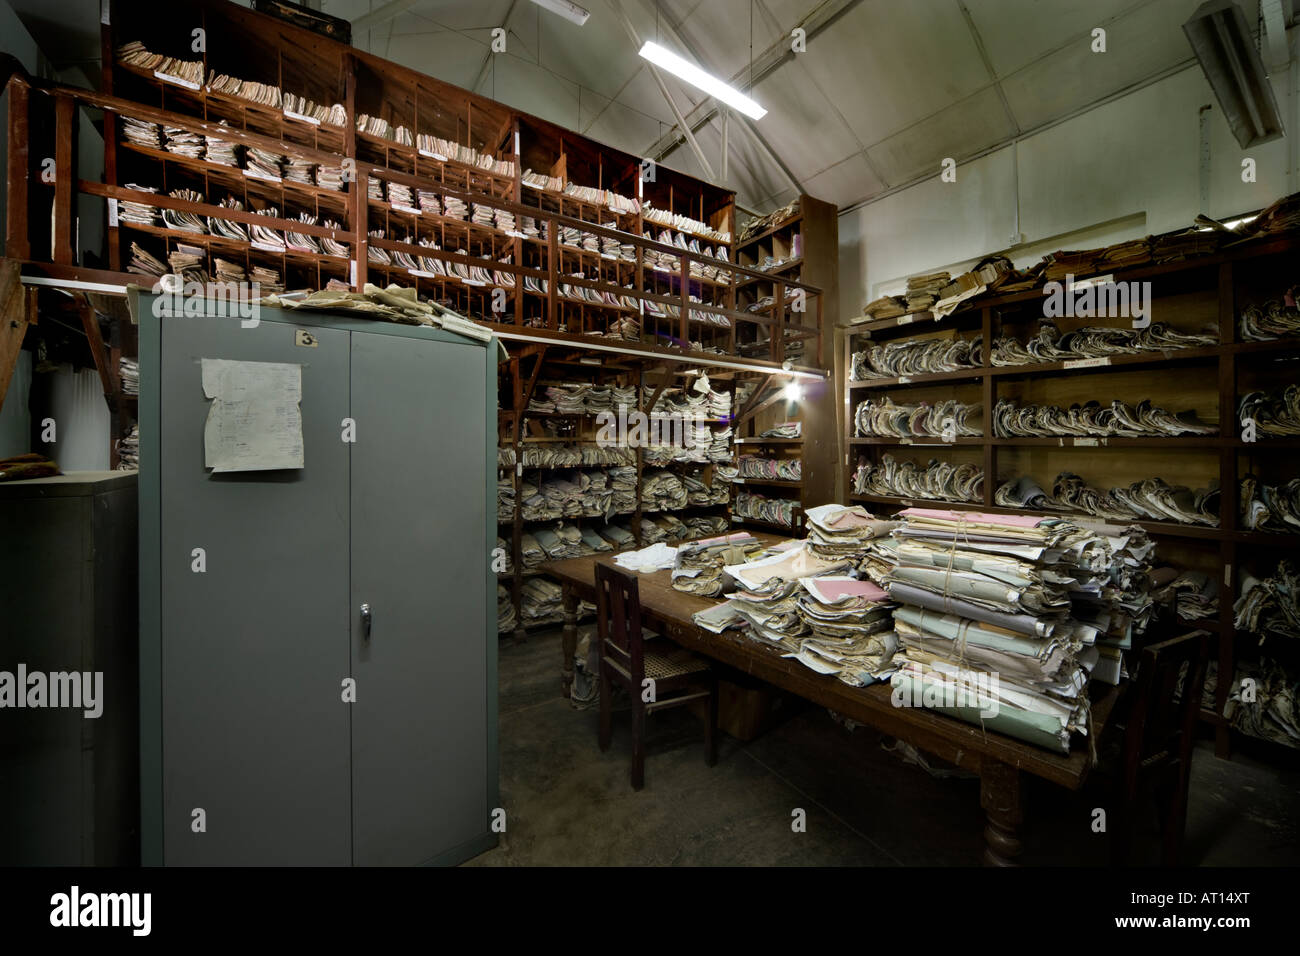 Almacenamiento de documentos en un tribunal archive en Sri Lanka Imagen De Stock